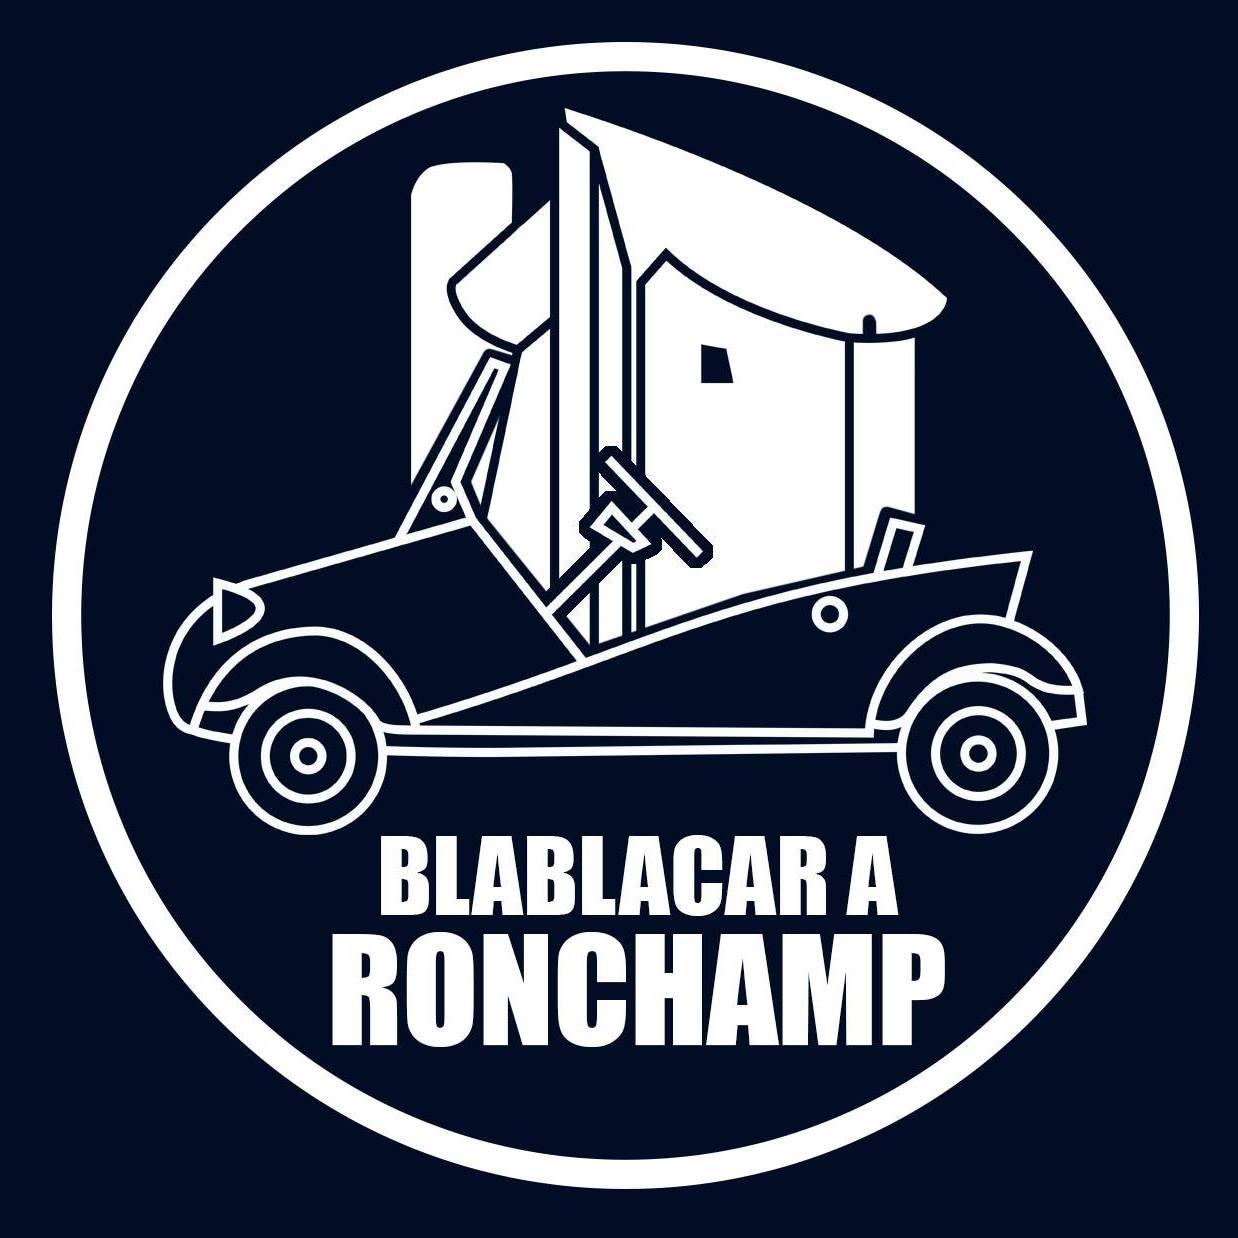 BlaBlaCar a Ronchamp